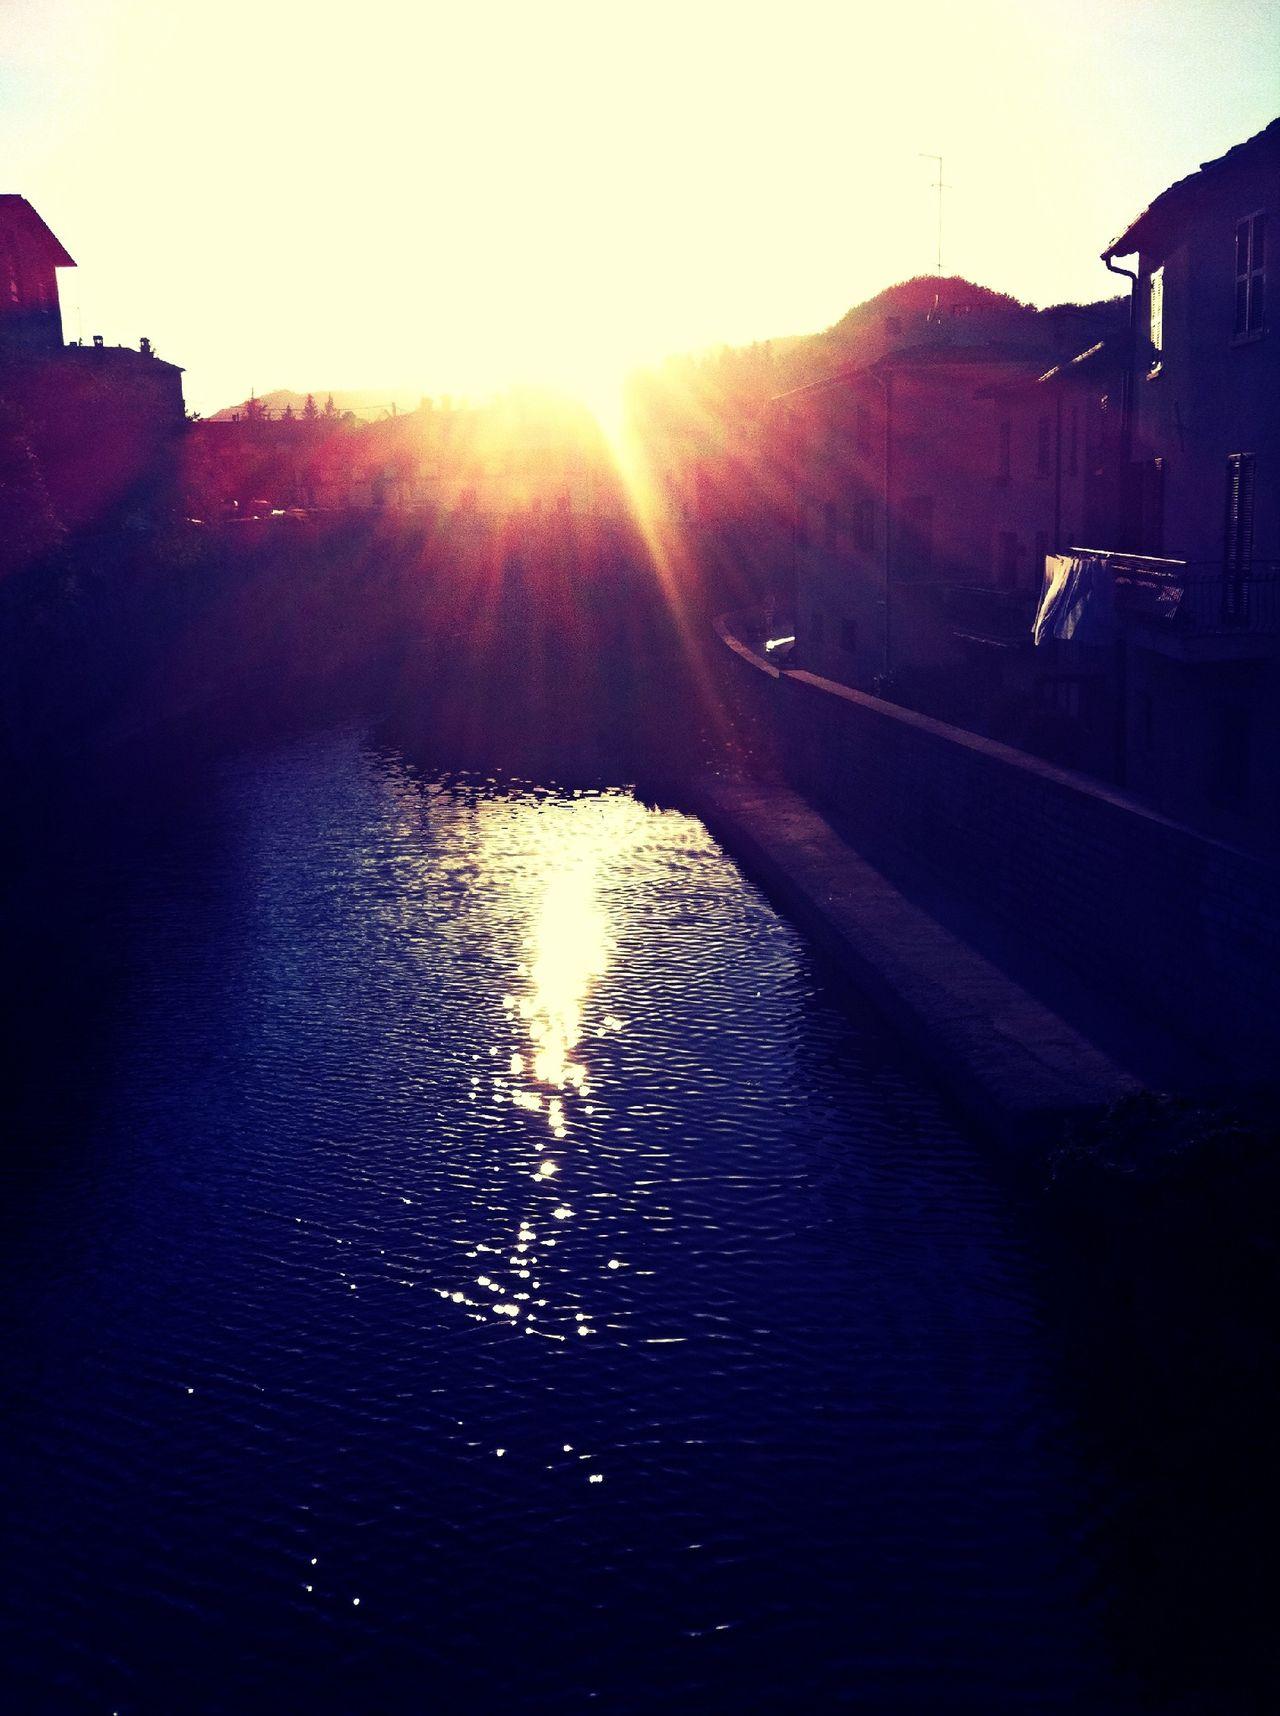 Sunset On Metauro River